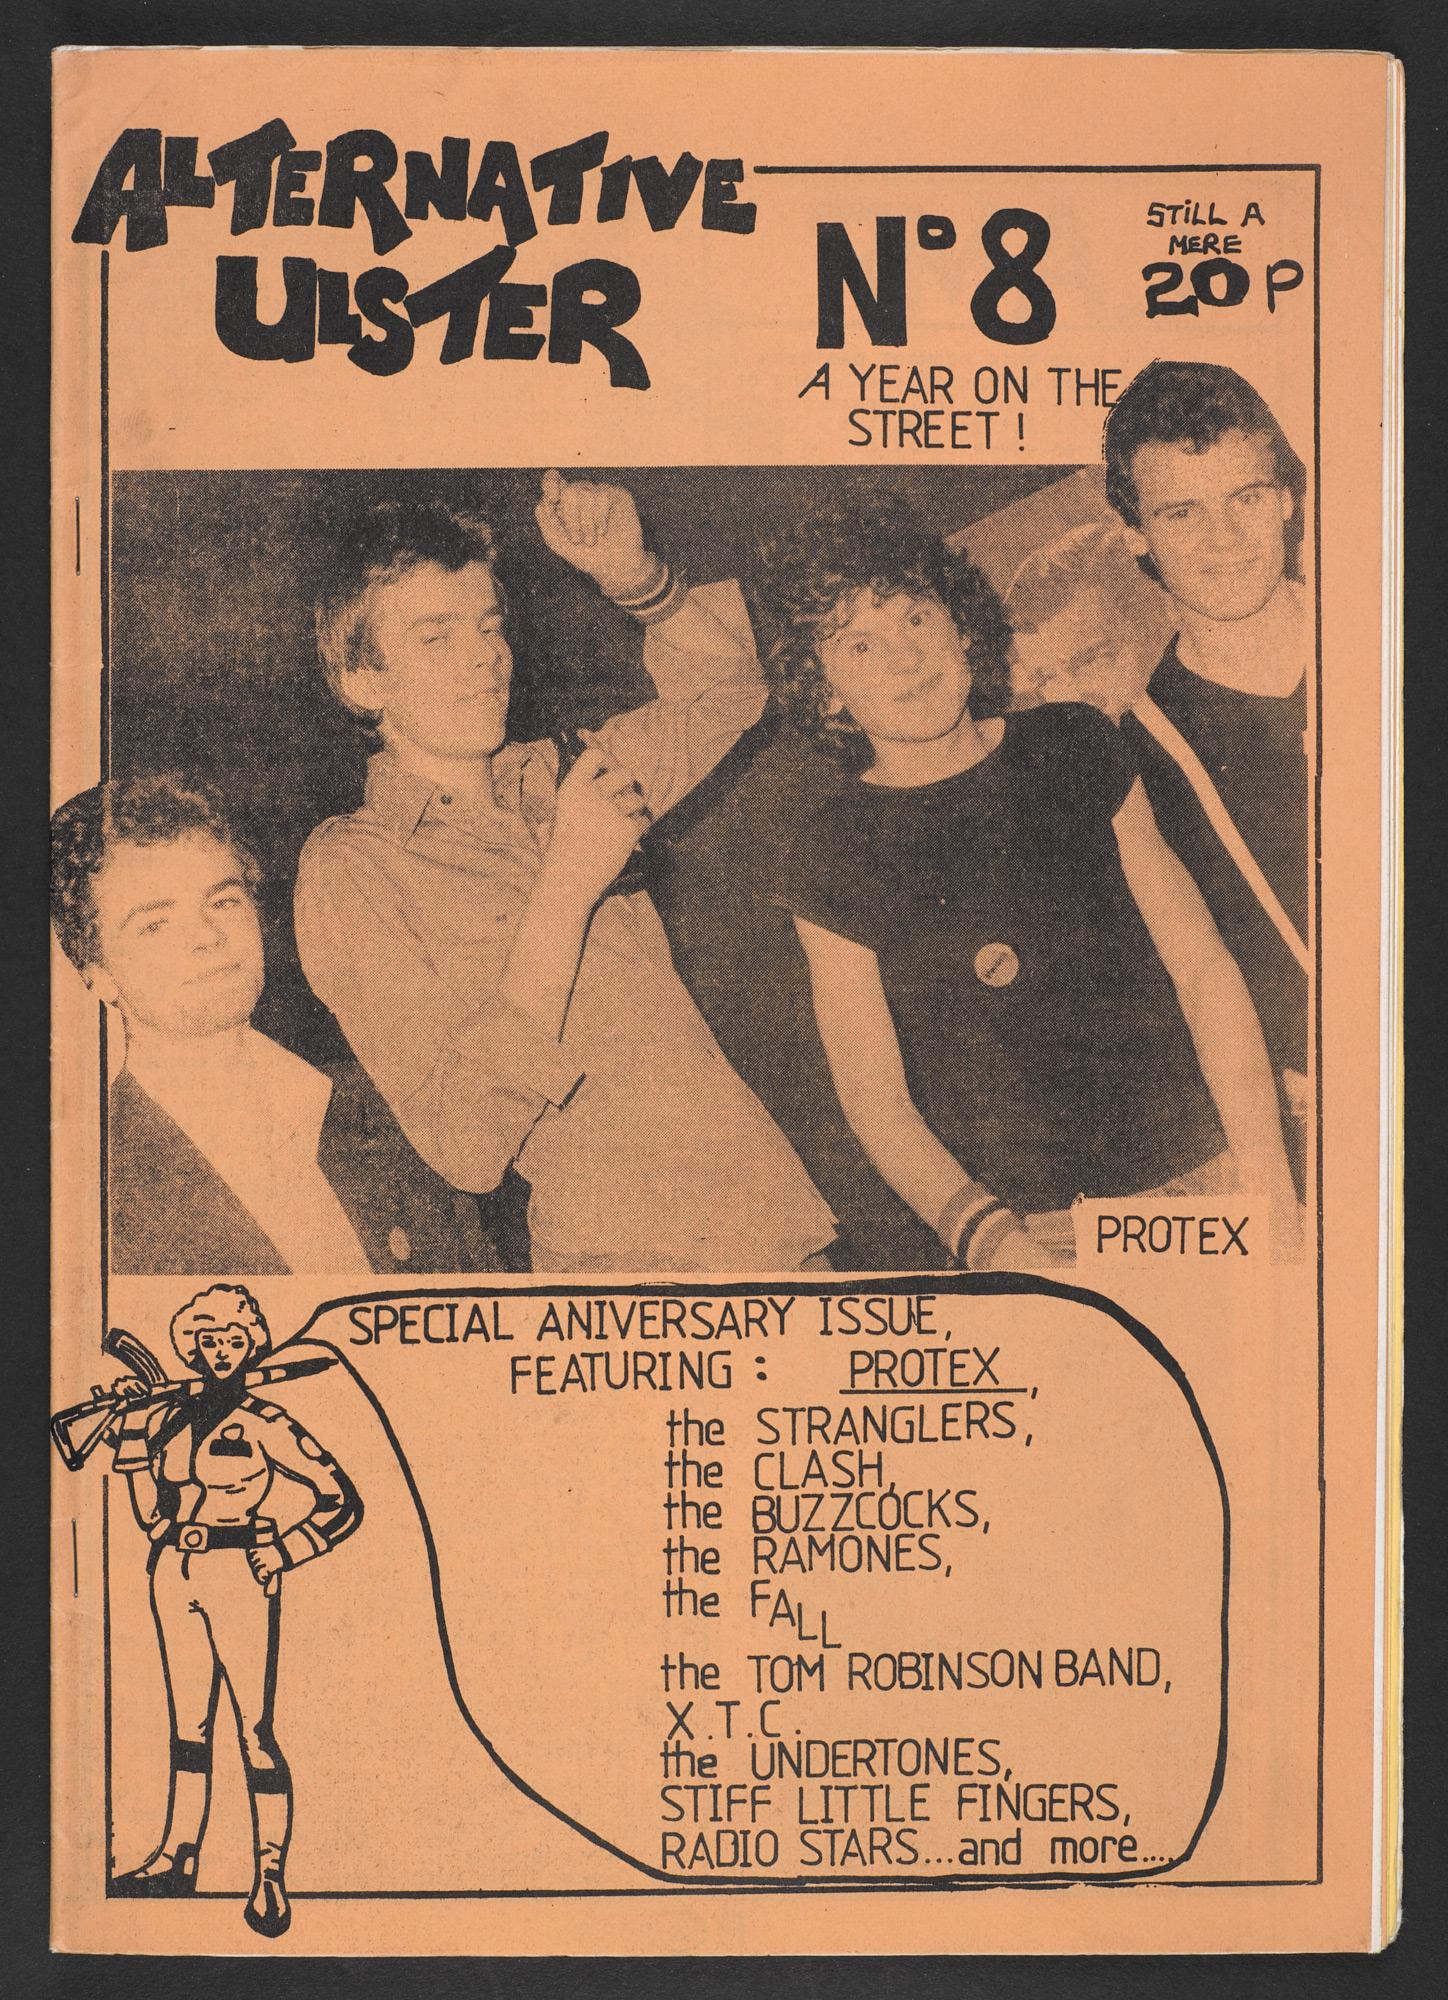 Alternative Ulster fanzine 1977